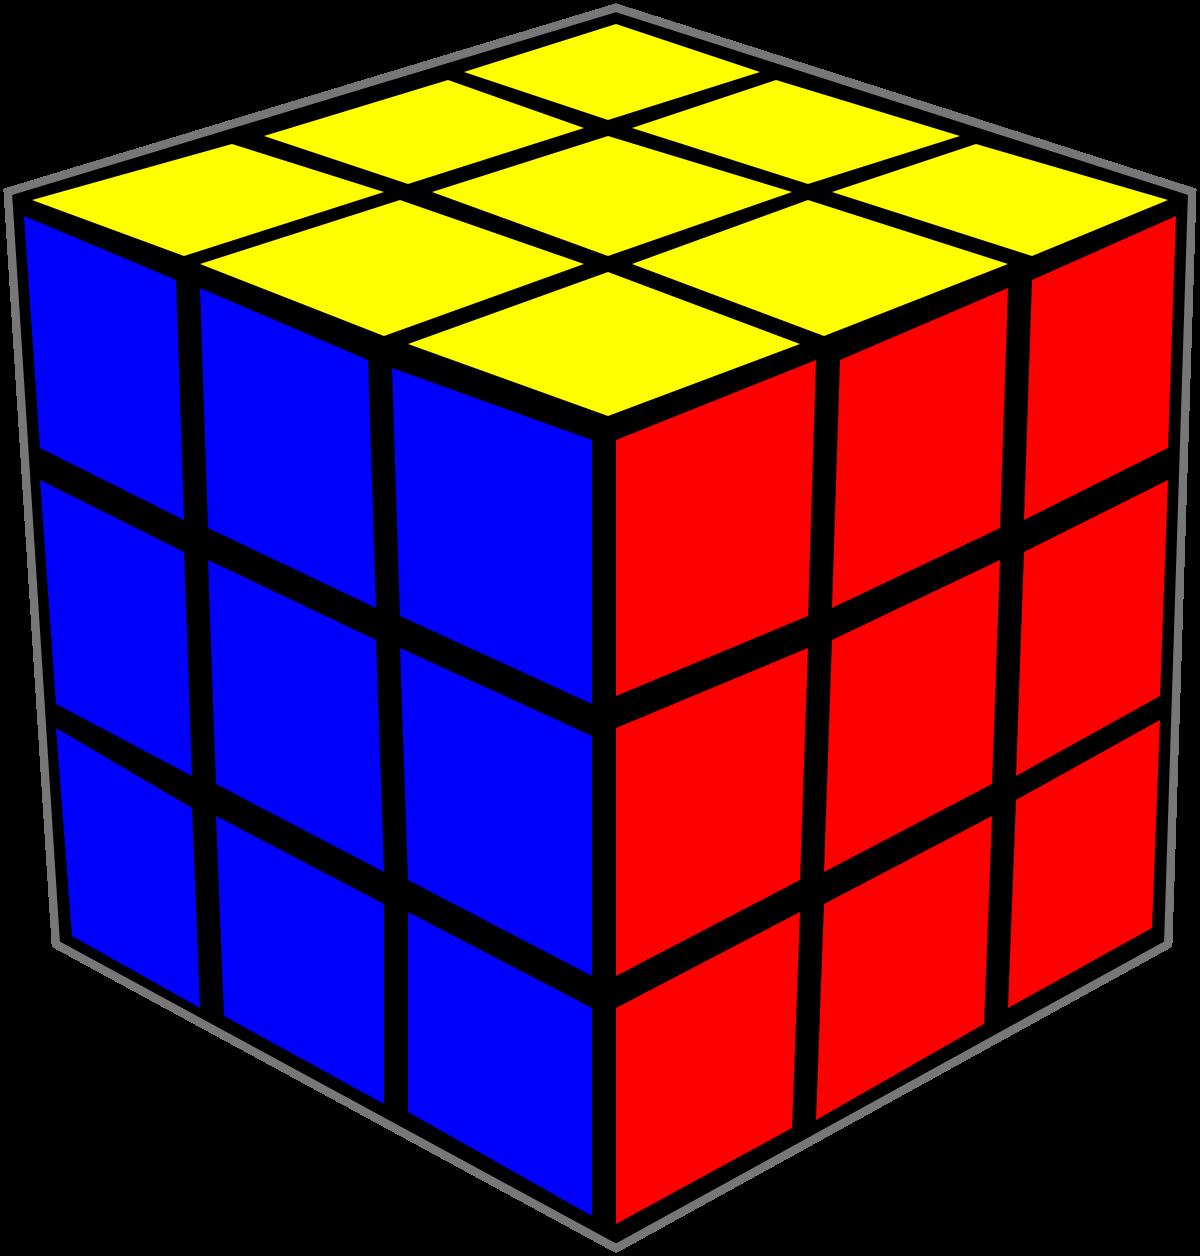 1200x1256 Rubik's Cube